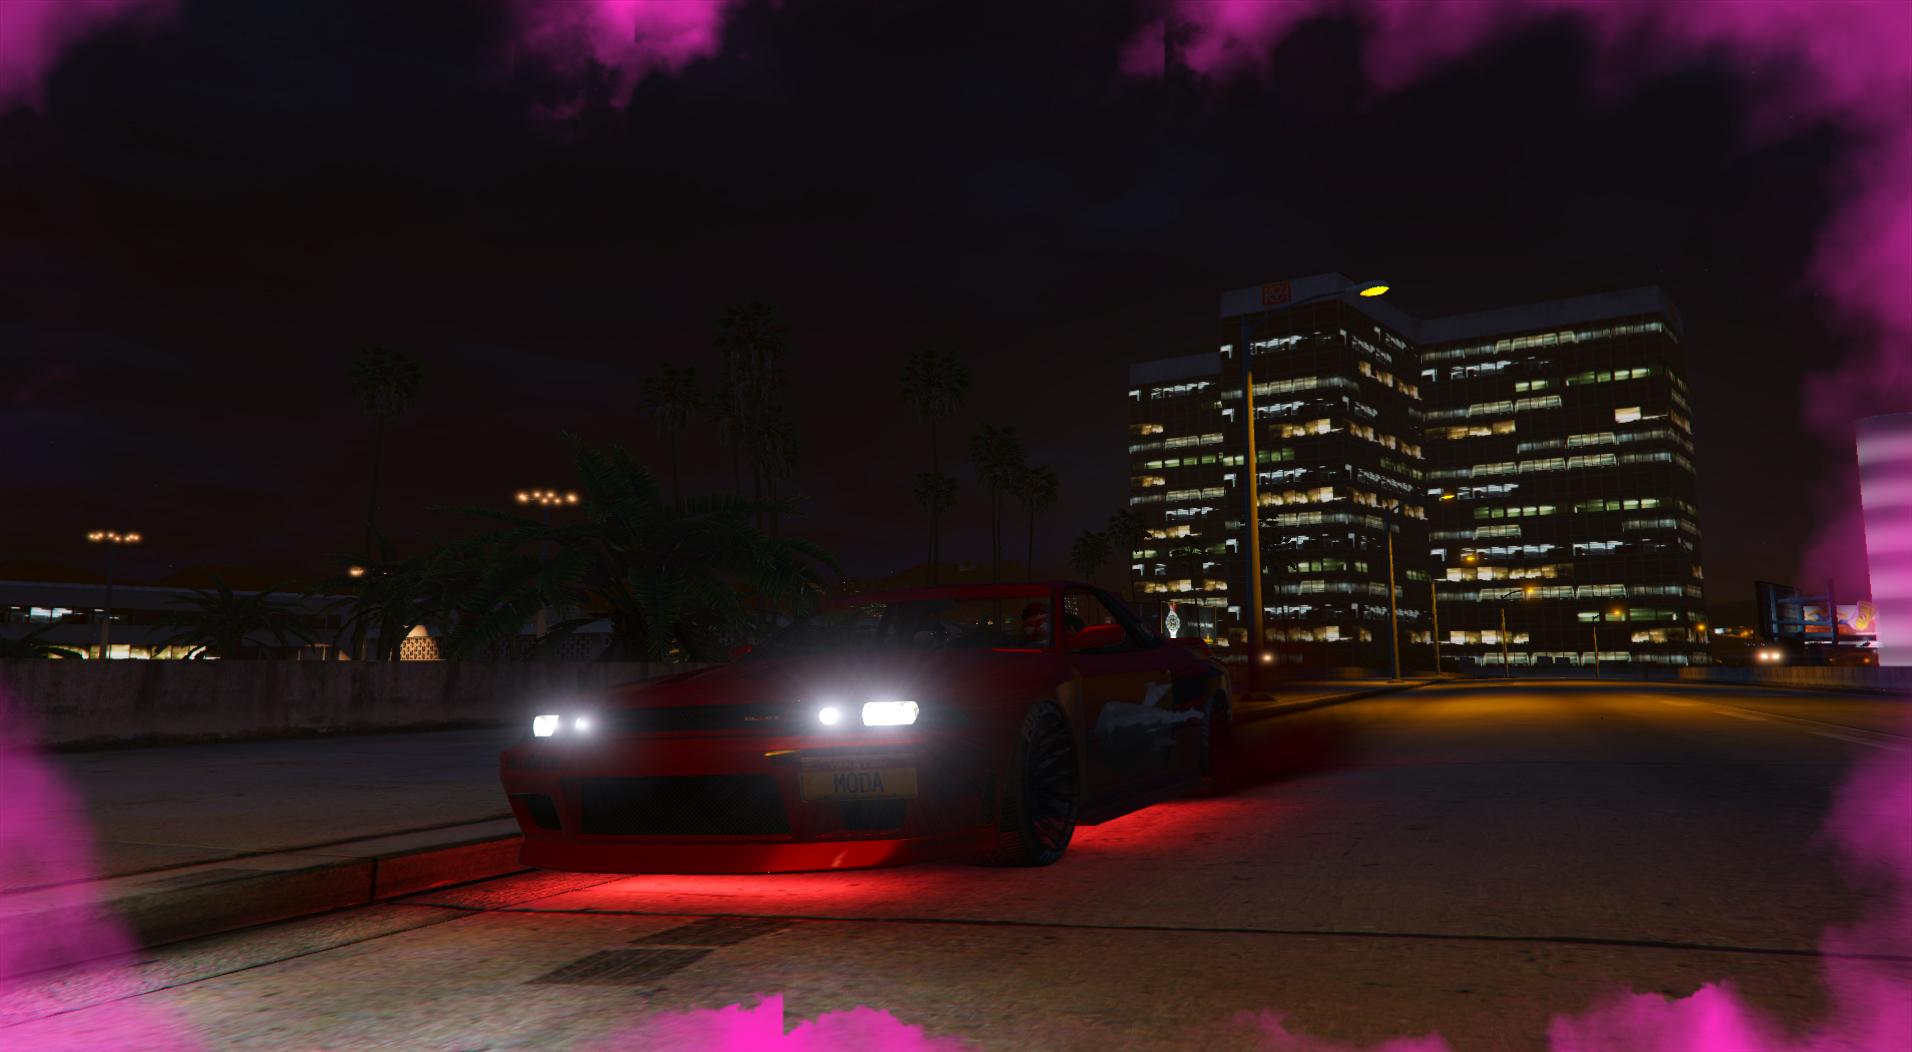 Grand_Theft_Auto_V_Screenshot_2021.03.05_-_20.03.jpg